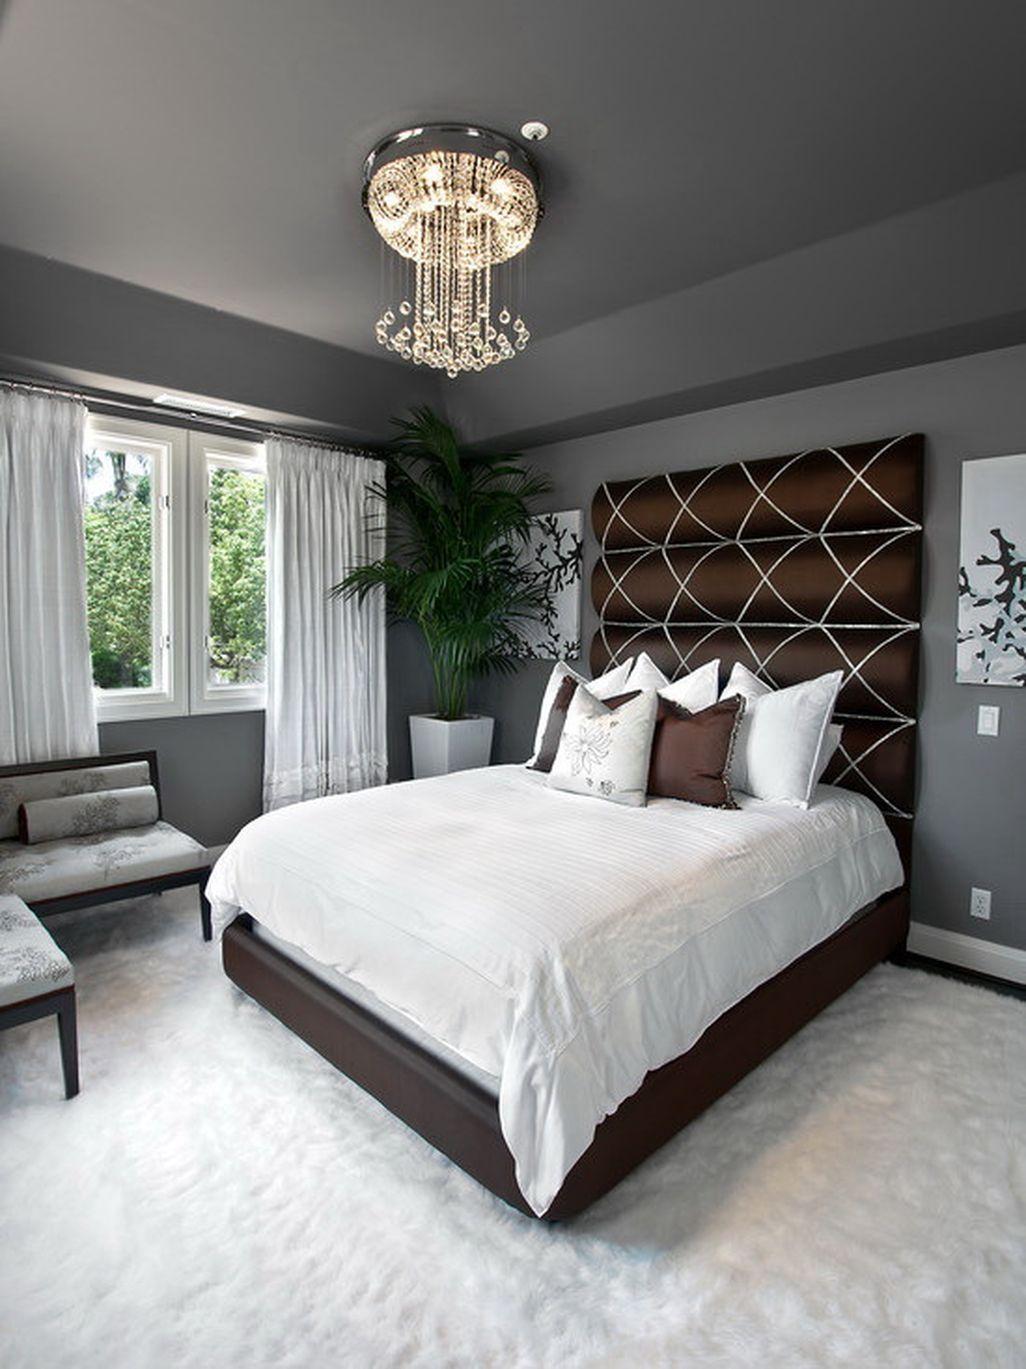 45 Elegant Small Master Bedroom Decoration Ideas Home Bedroom Small Master Bedroom Contemporary Bedroom